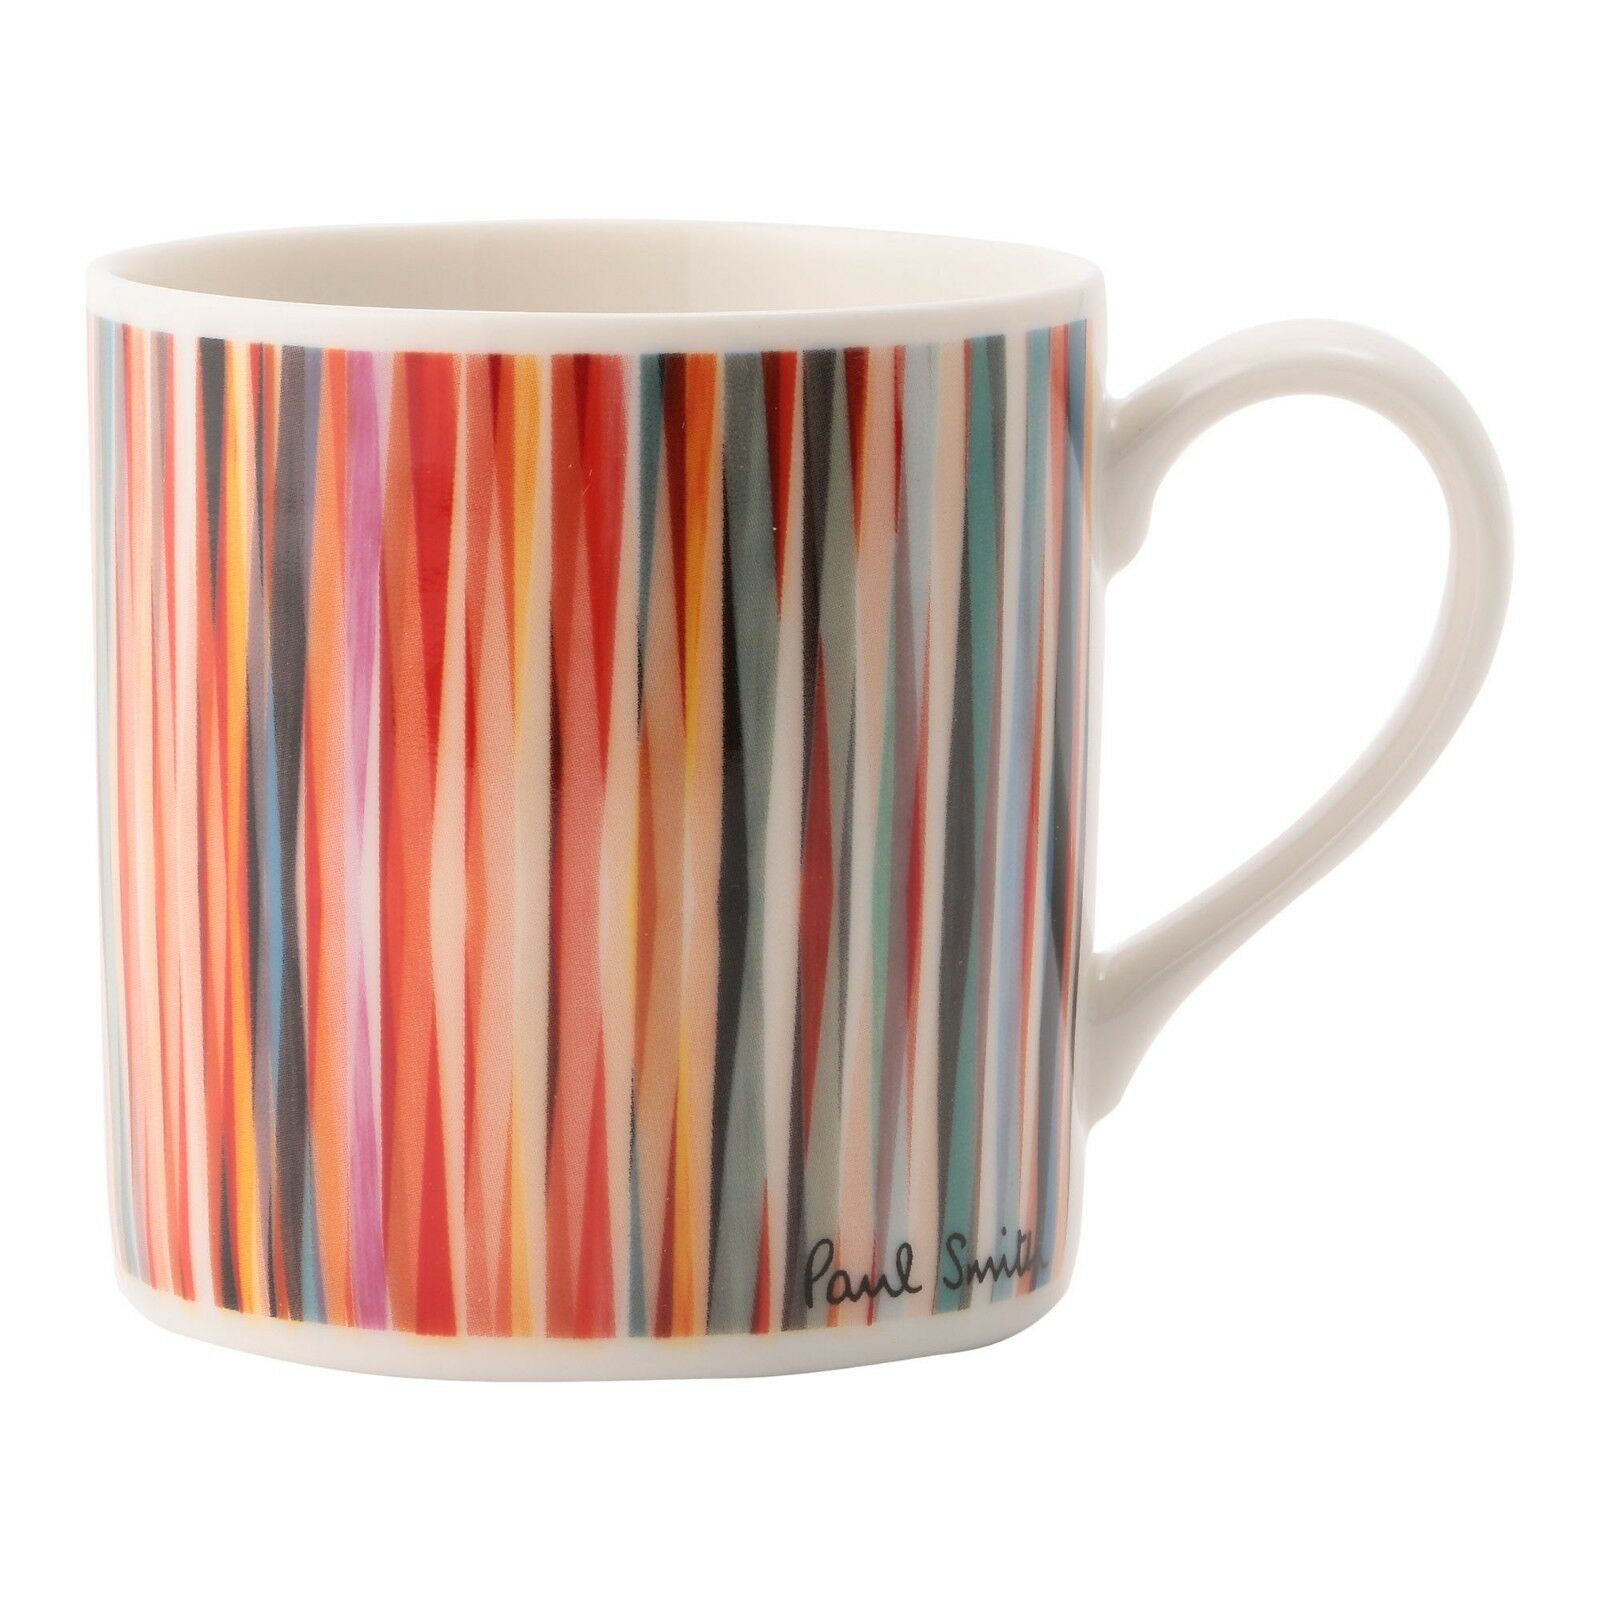 2019 New Paul Smith Mug  Crougever Stripe  Multi-Stripe Japon-Fait RARE